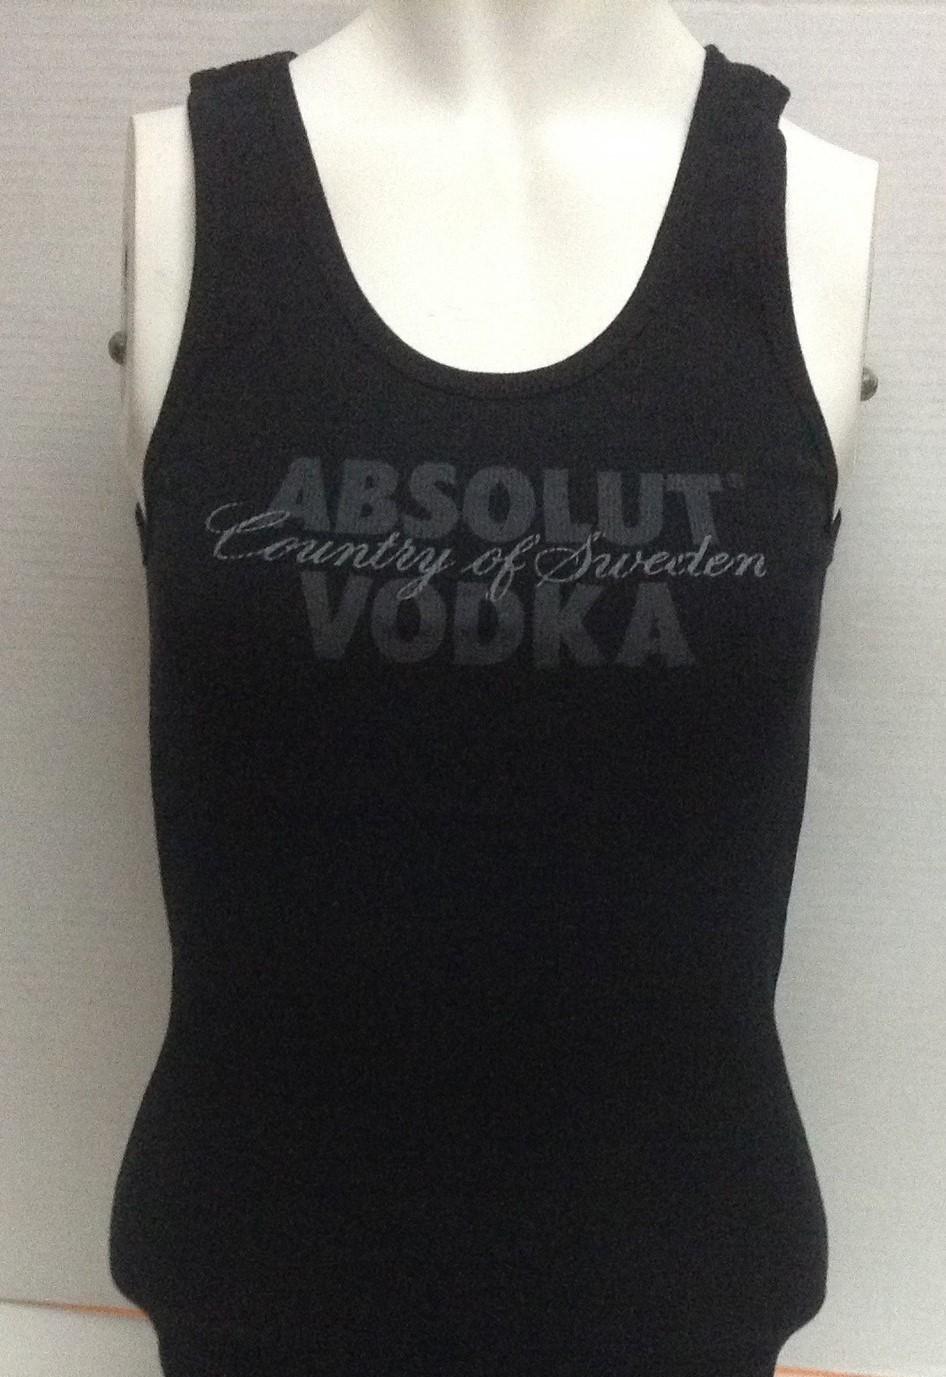 Women's Absolut Vodka Black Tank Top NWOT Sz M Made in USA